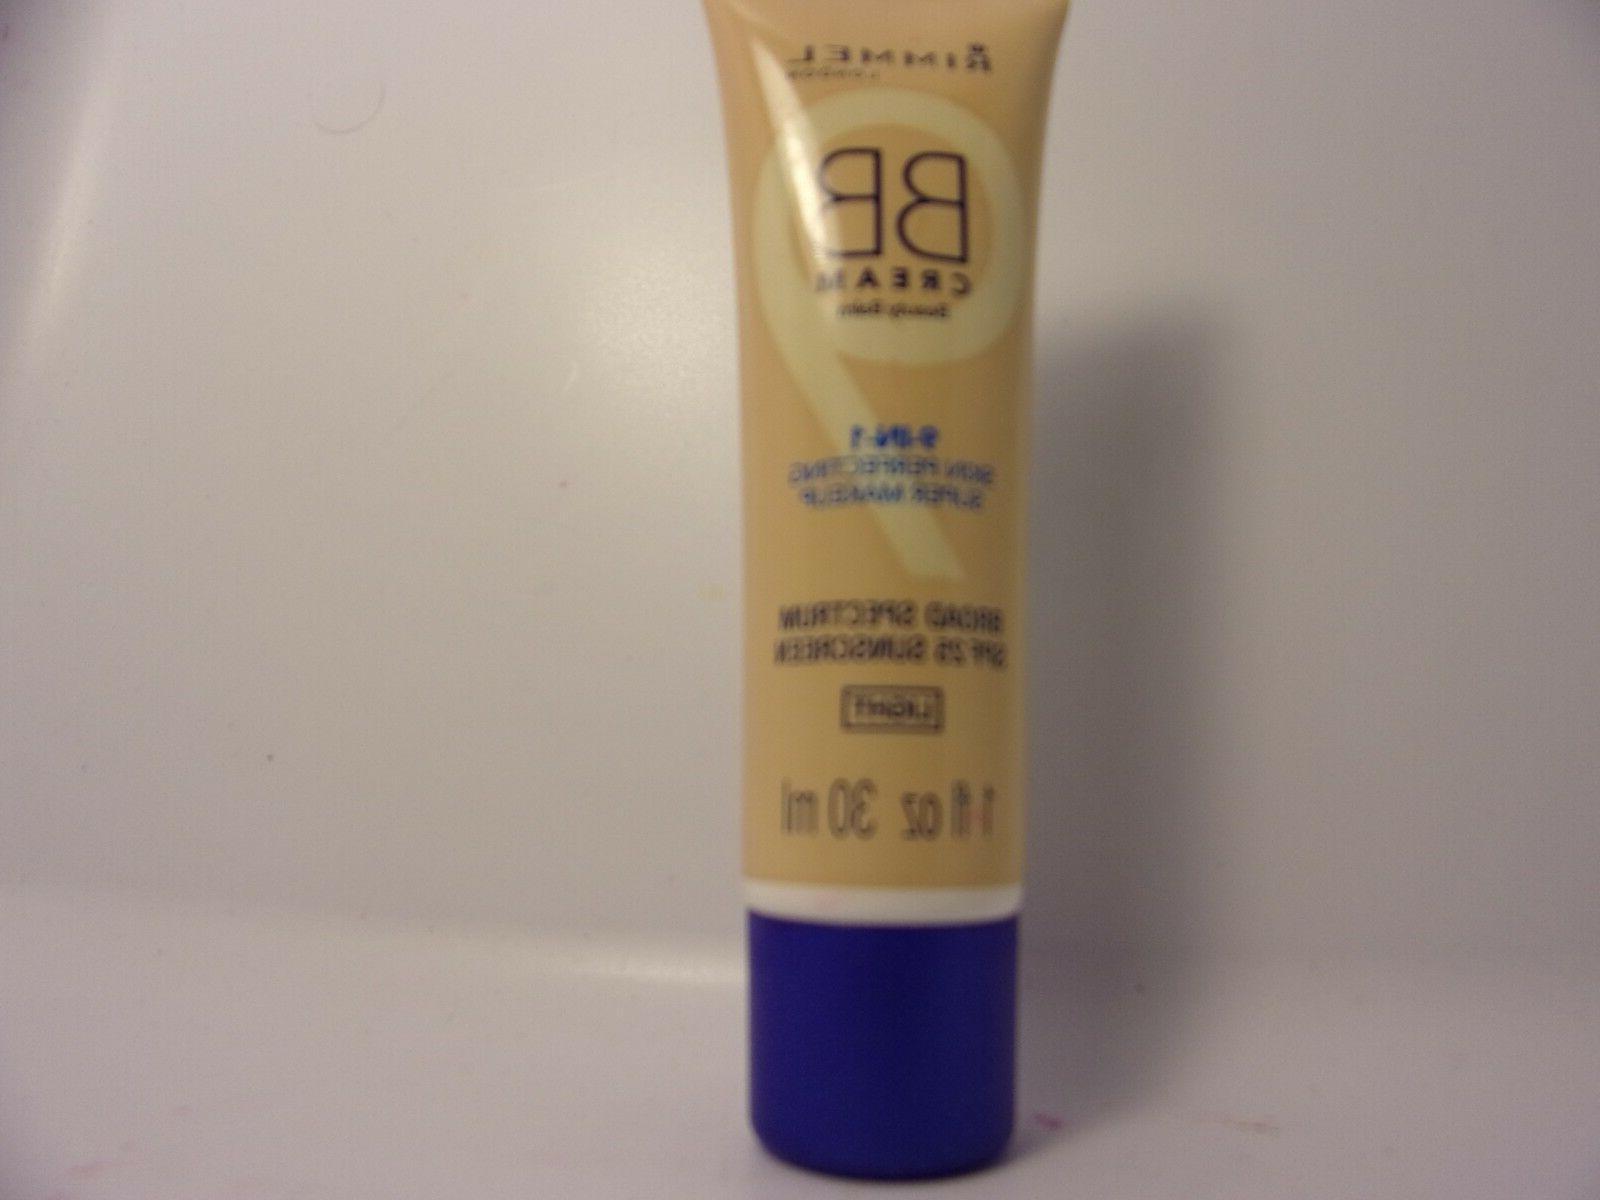 bb cream beauty balm 9 in 1